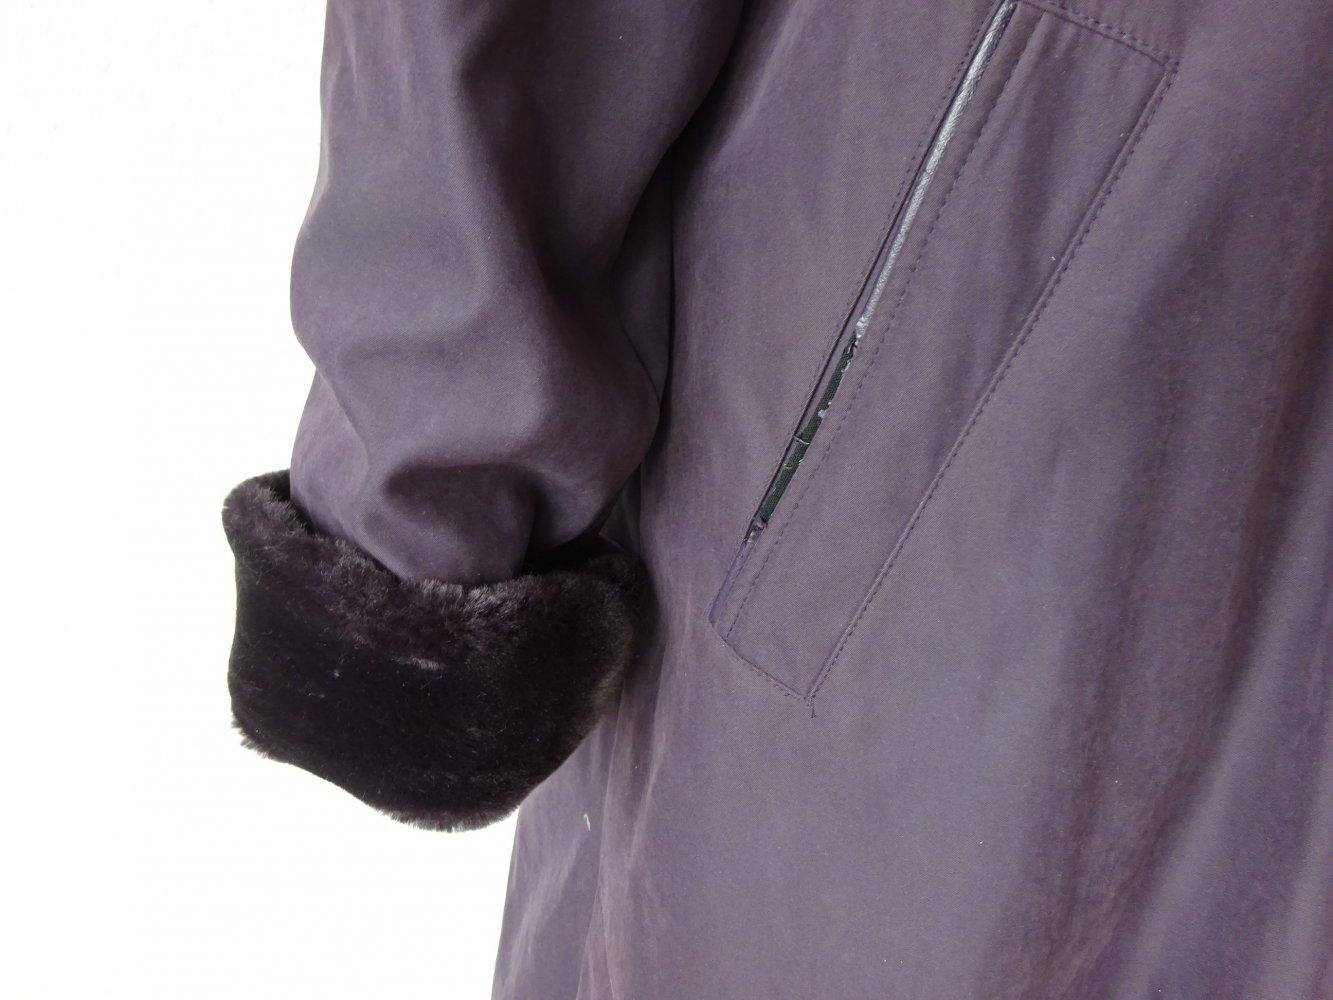 Mantel mit herausnehmbarem innenfutter